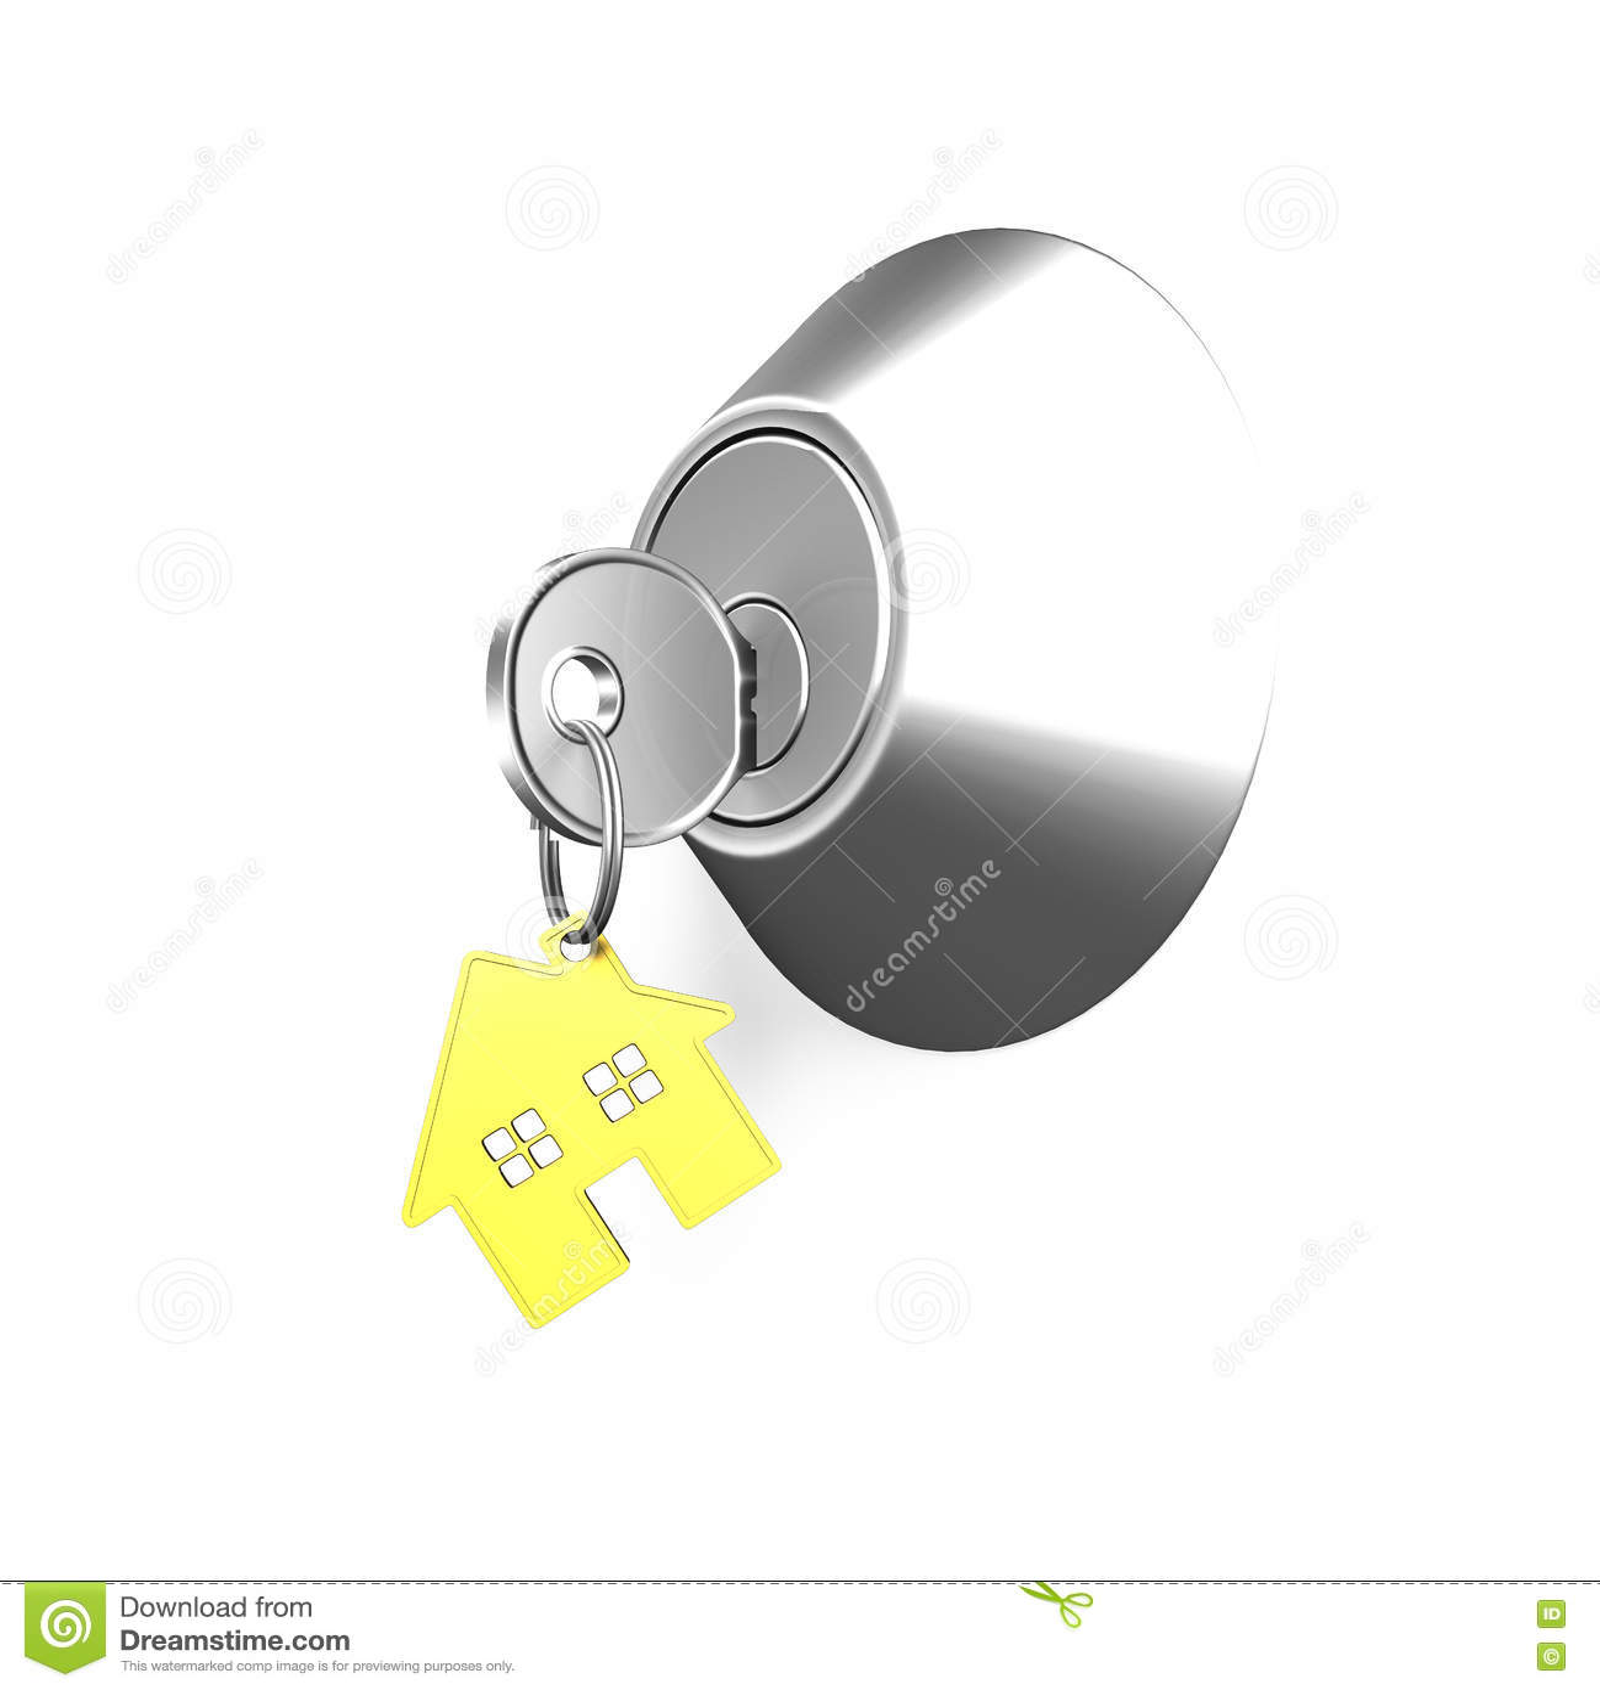 door lock and key cartoon. Locked Out Cartoons Door Lock And Key Cartoon